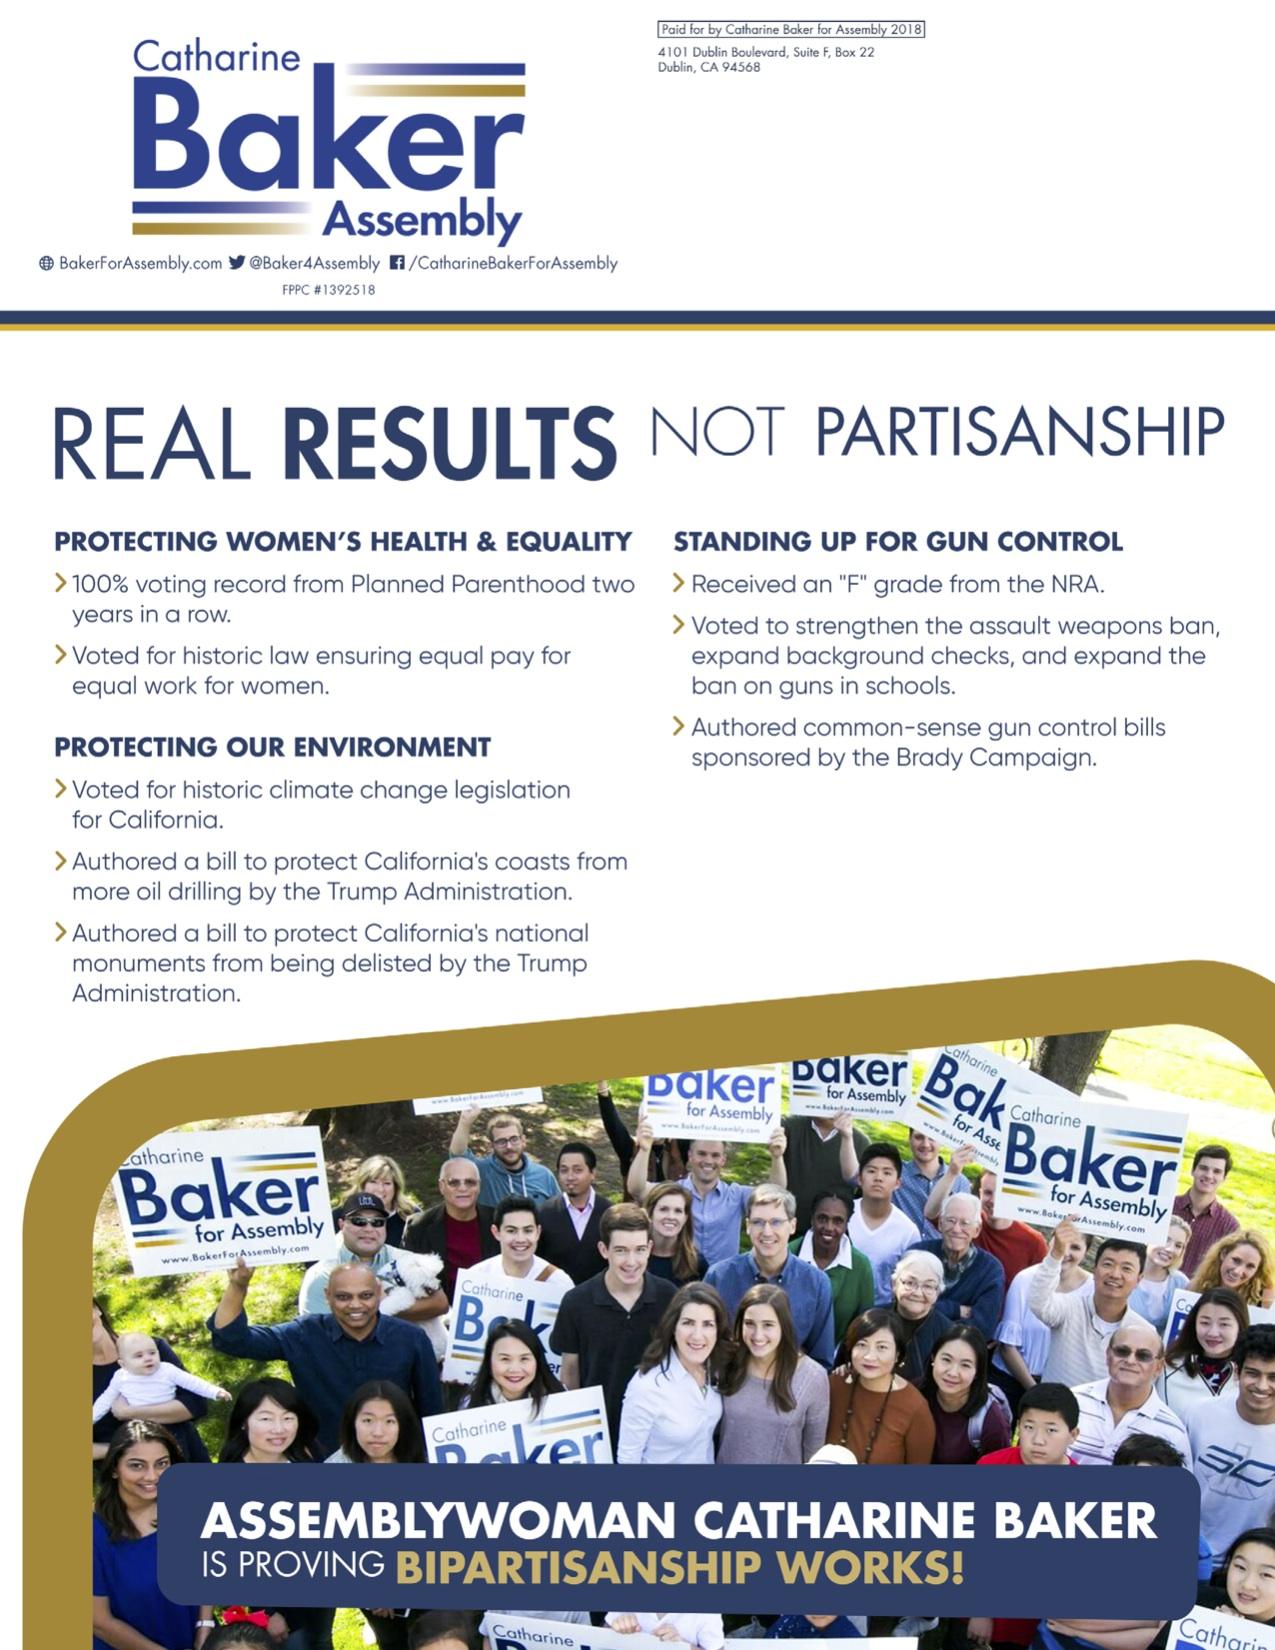 Baker-02BipartisanshipWorks-FINAL (1) 2.jpg